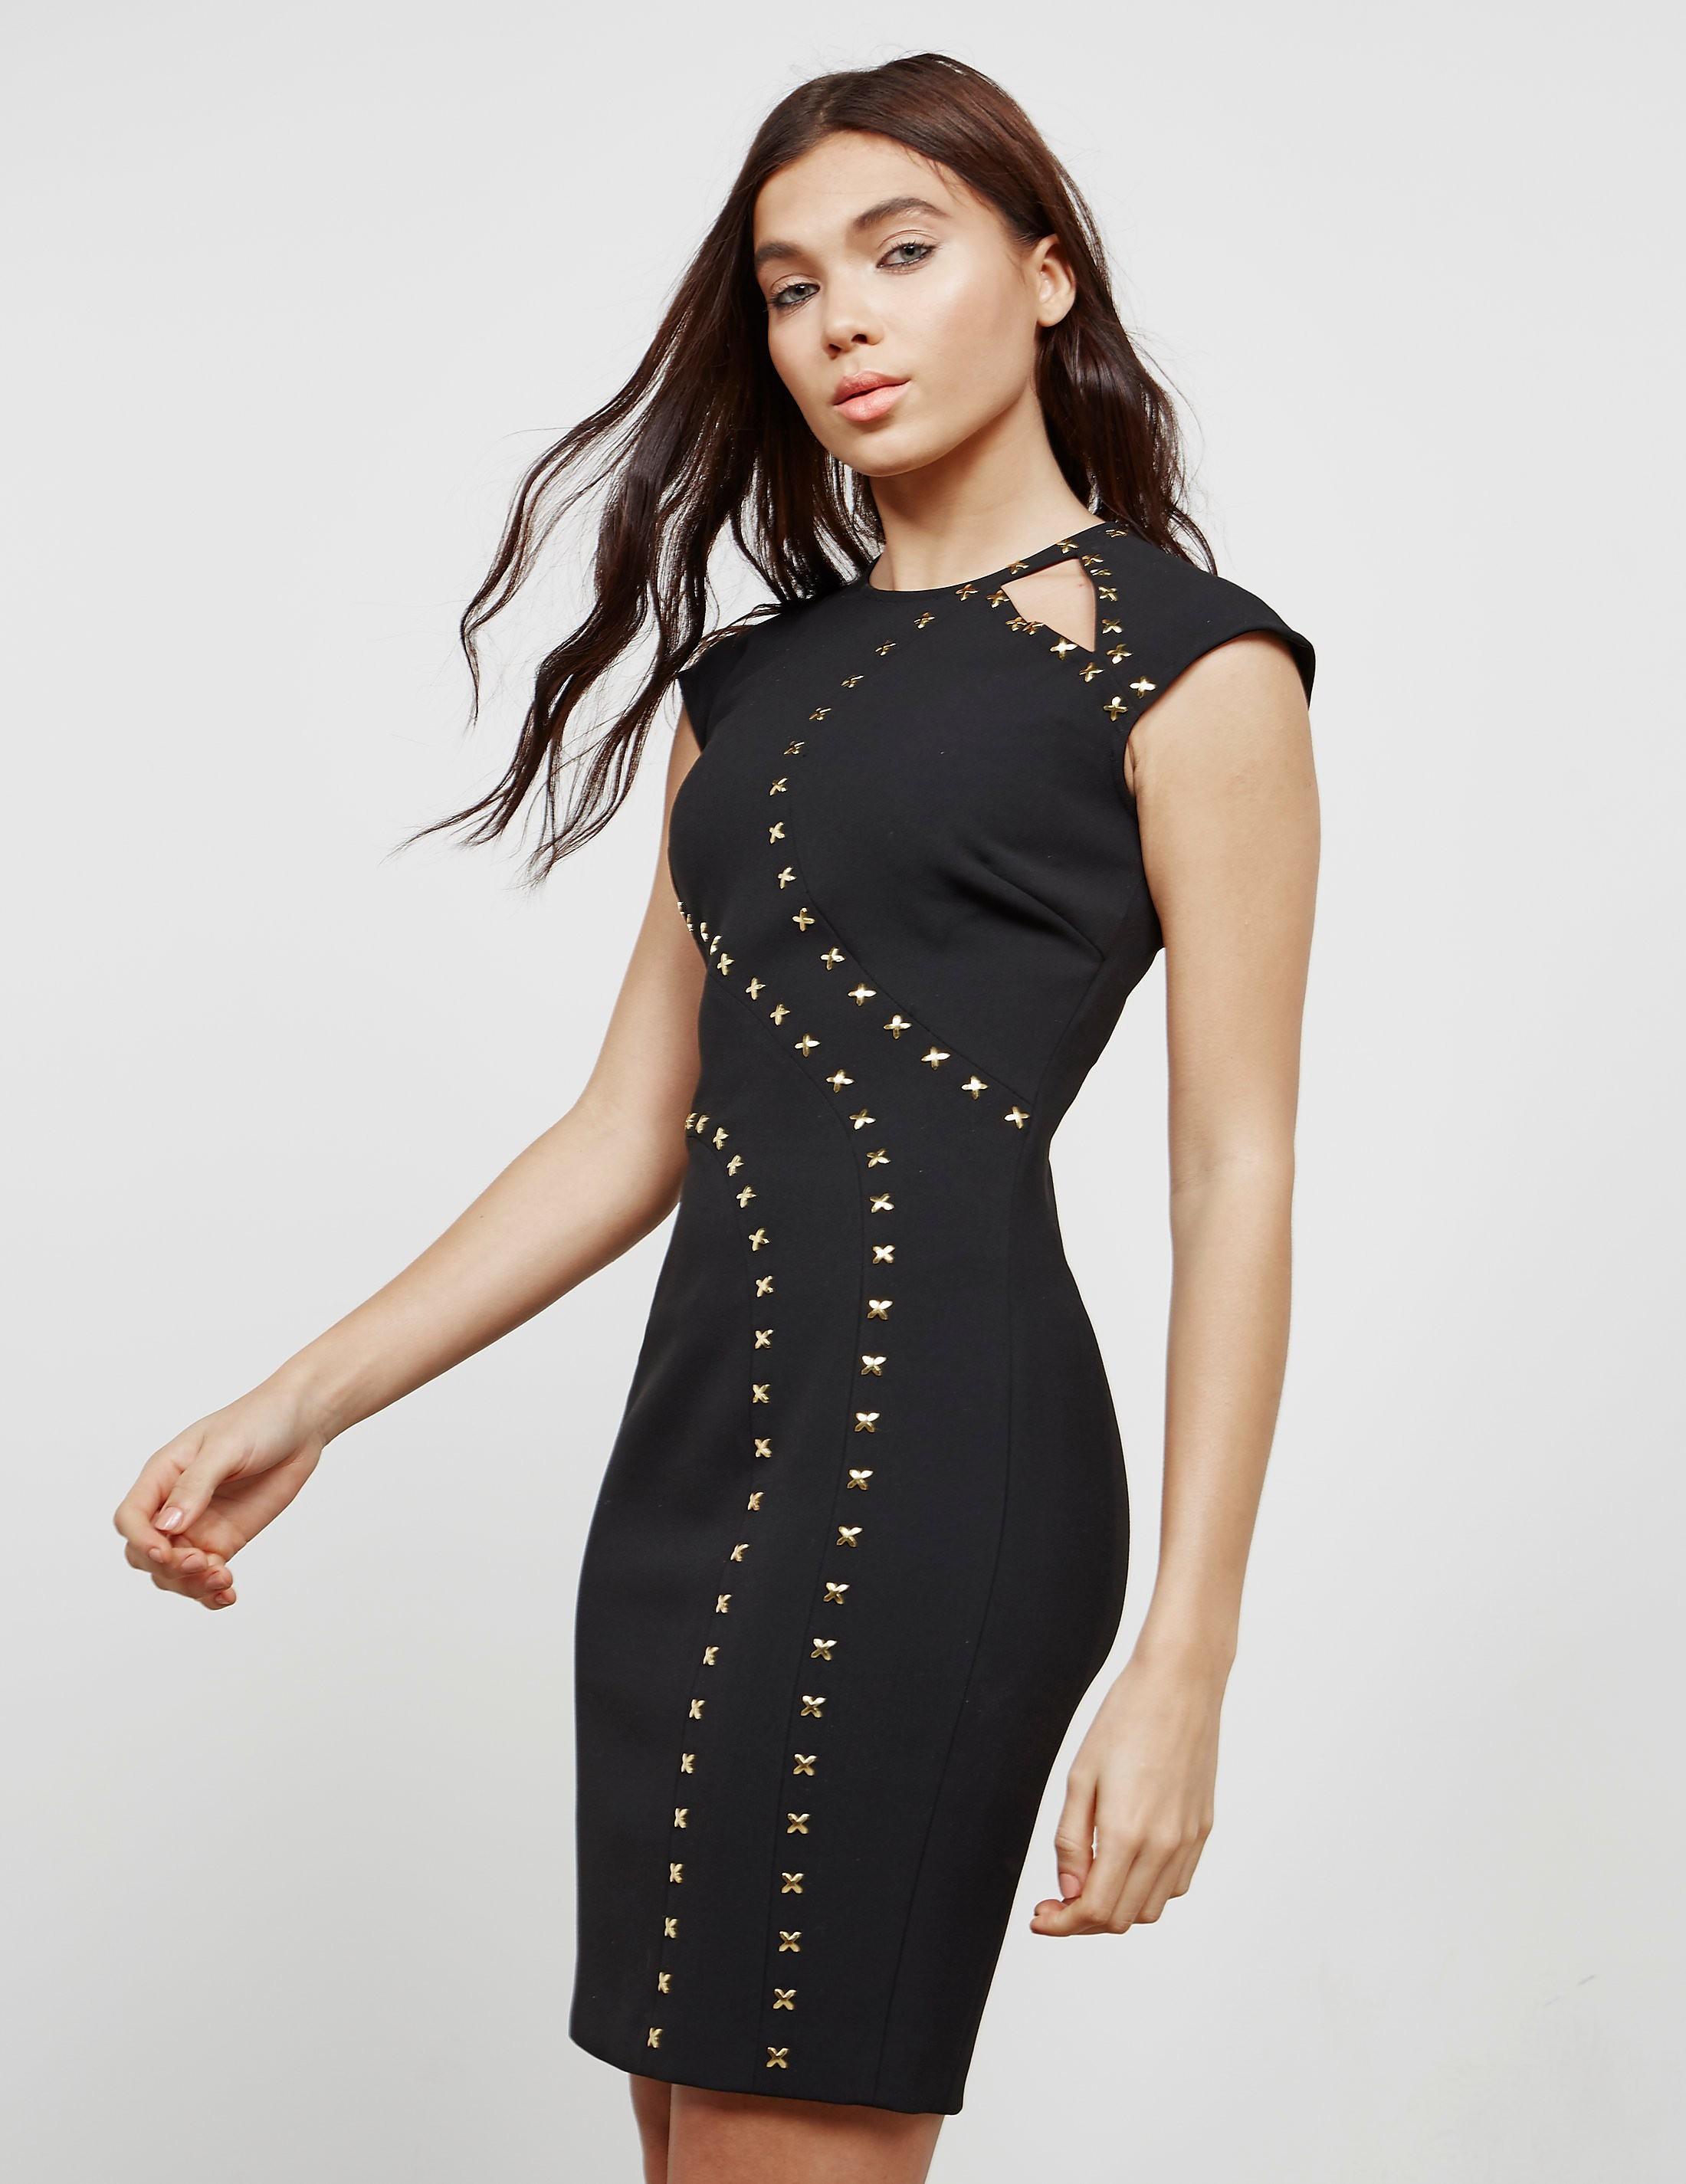 Versace Stud Dress